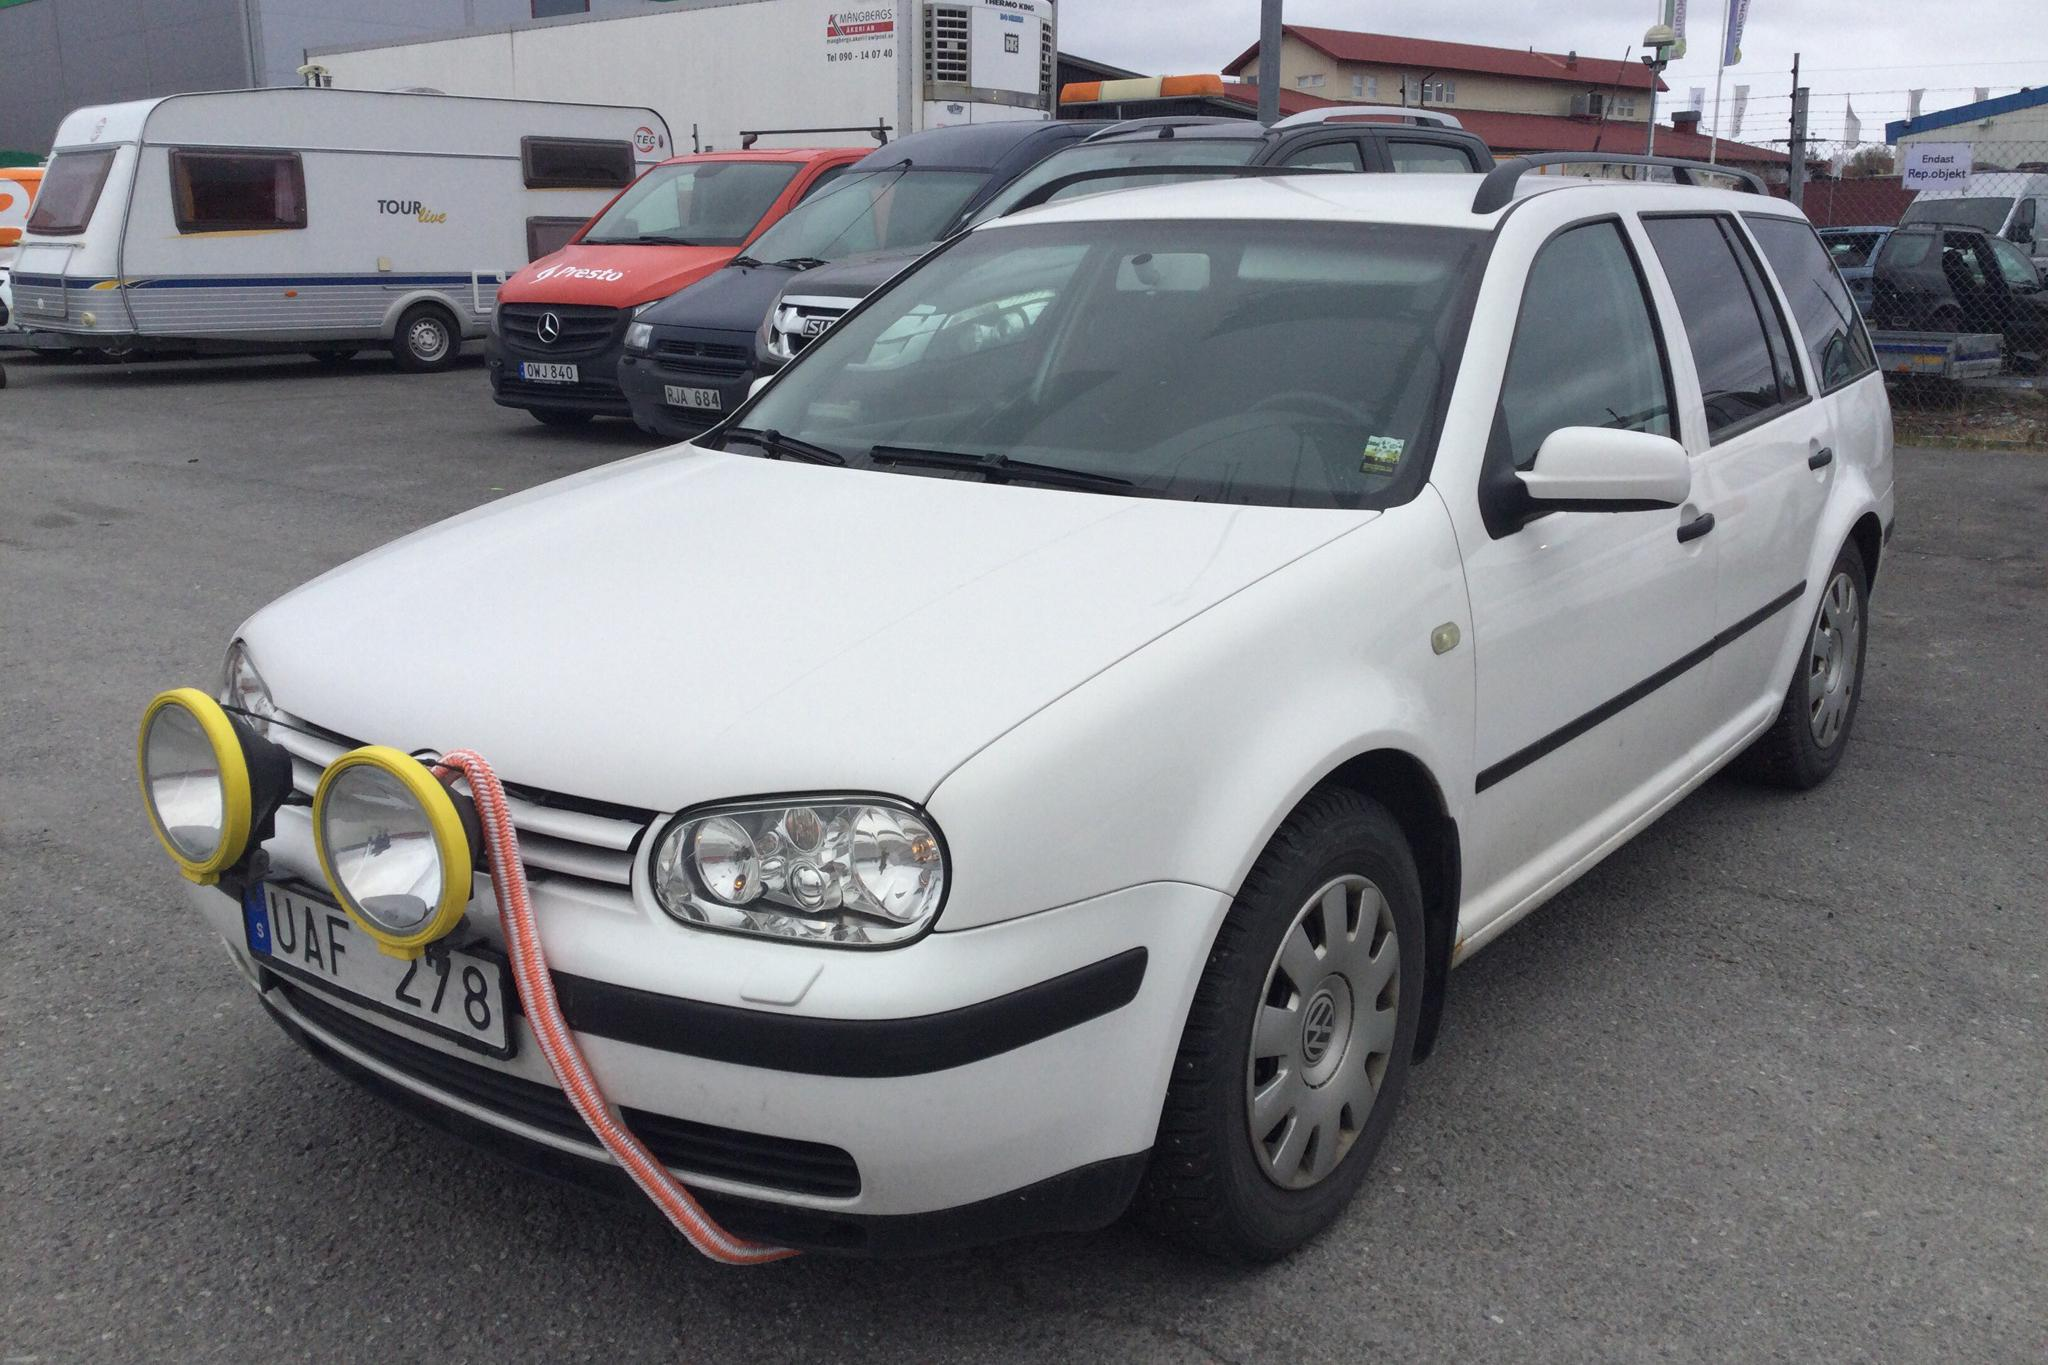 VW Golf IV 1.9 TDI Variant 4-Motion (130hk) - 152 170 km - Manual - white - 2003